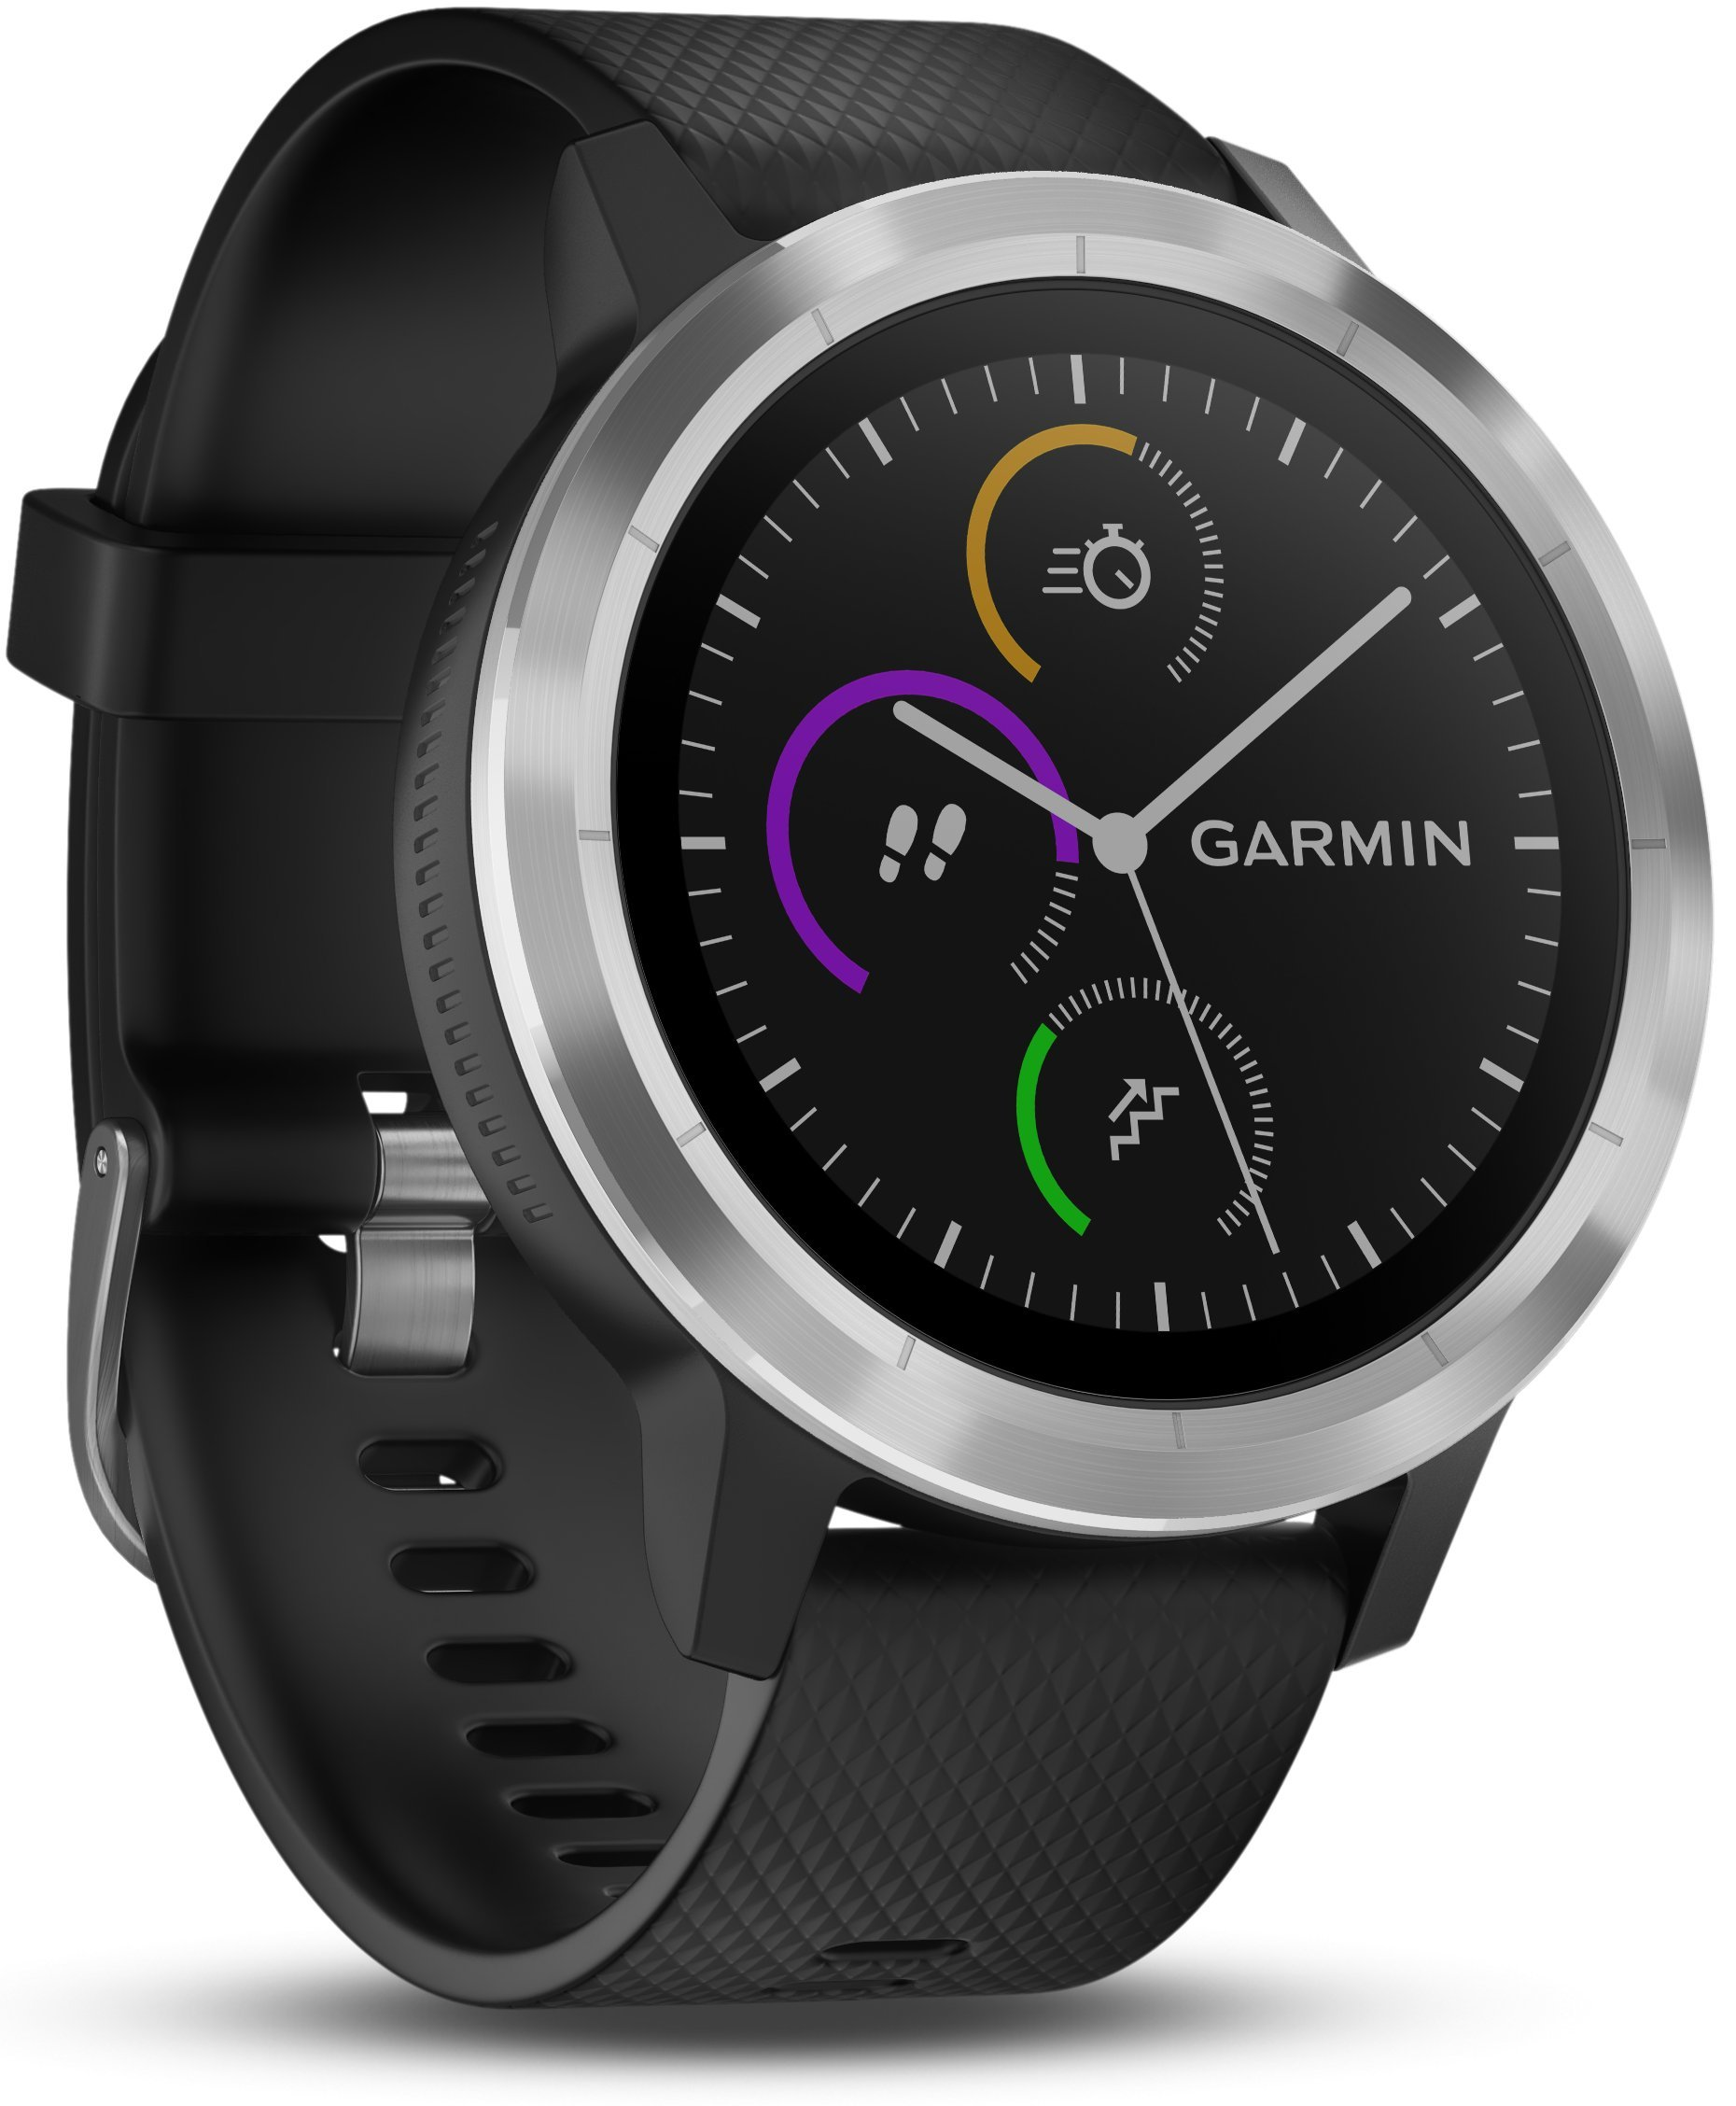 Smartwatch GARMIN Vivoactive 3 1,2'' GPS Waterproof 5 ATM Glonass Black Stainless Steel